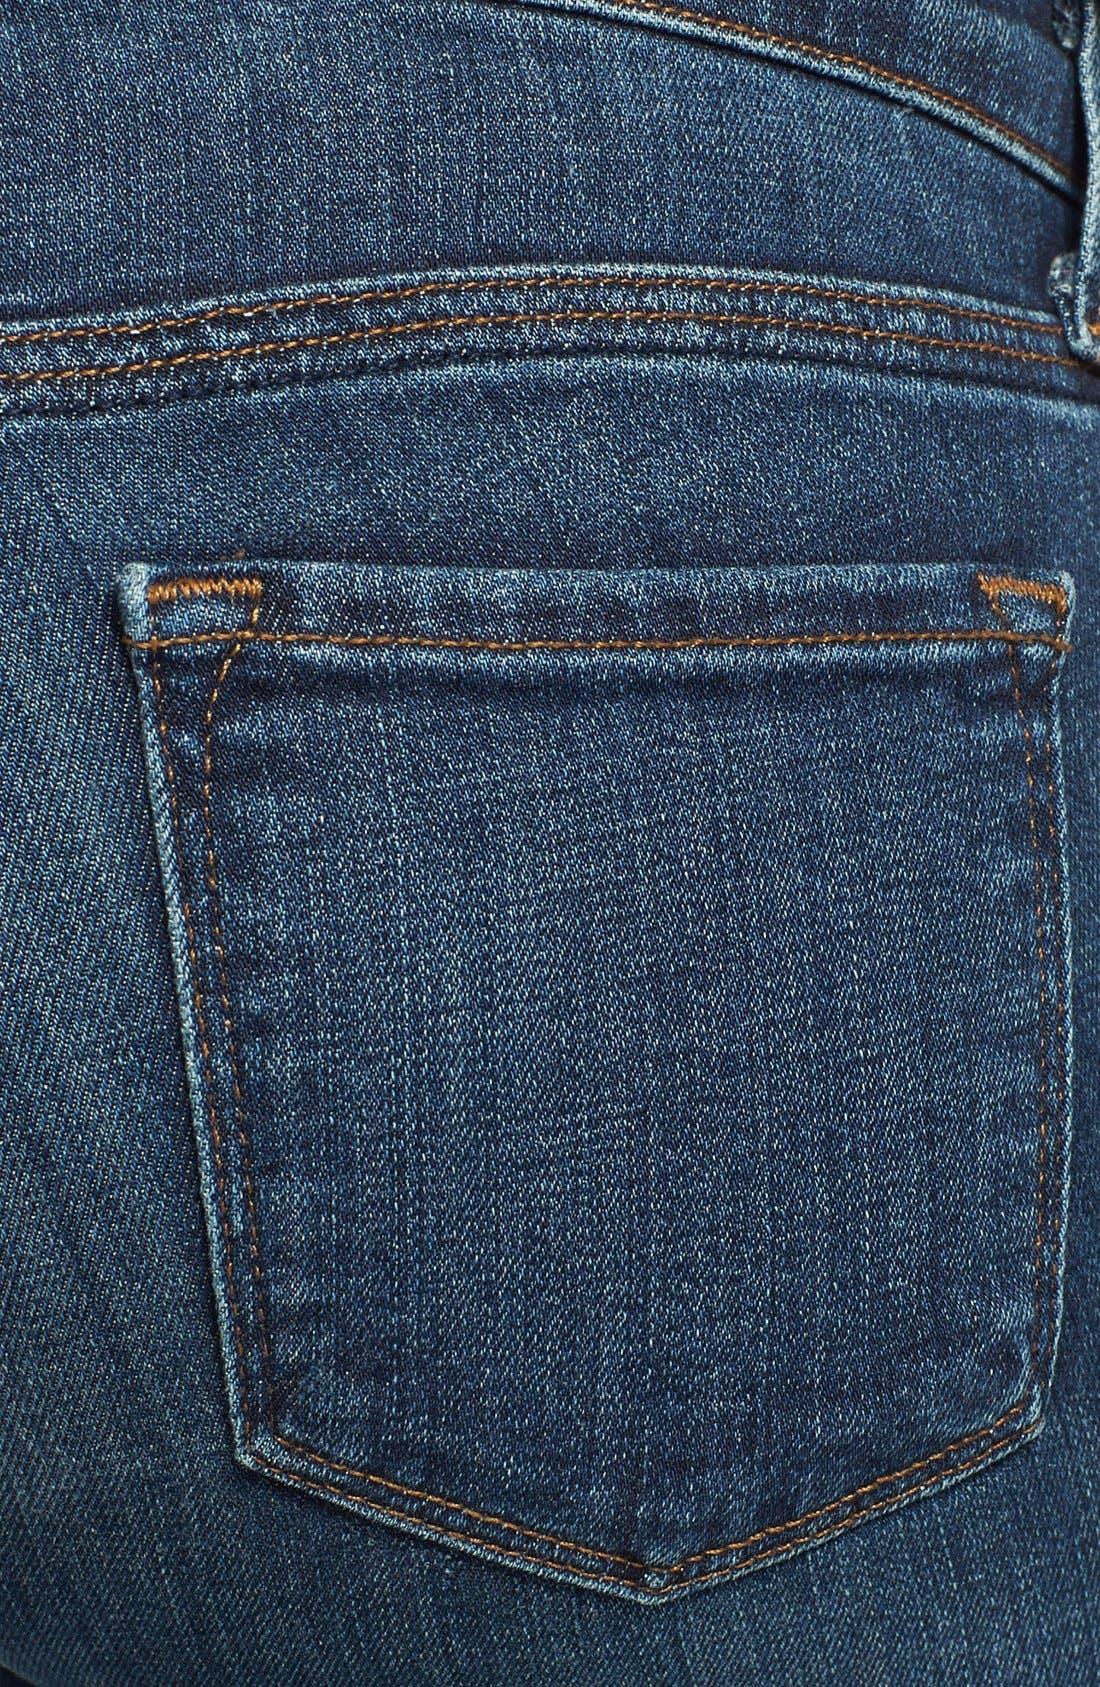 Alternate Image 3  - J Brand 'Rail' Skinny Maternity Jeans (Eminence)